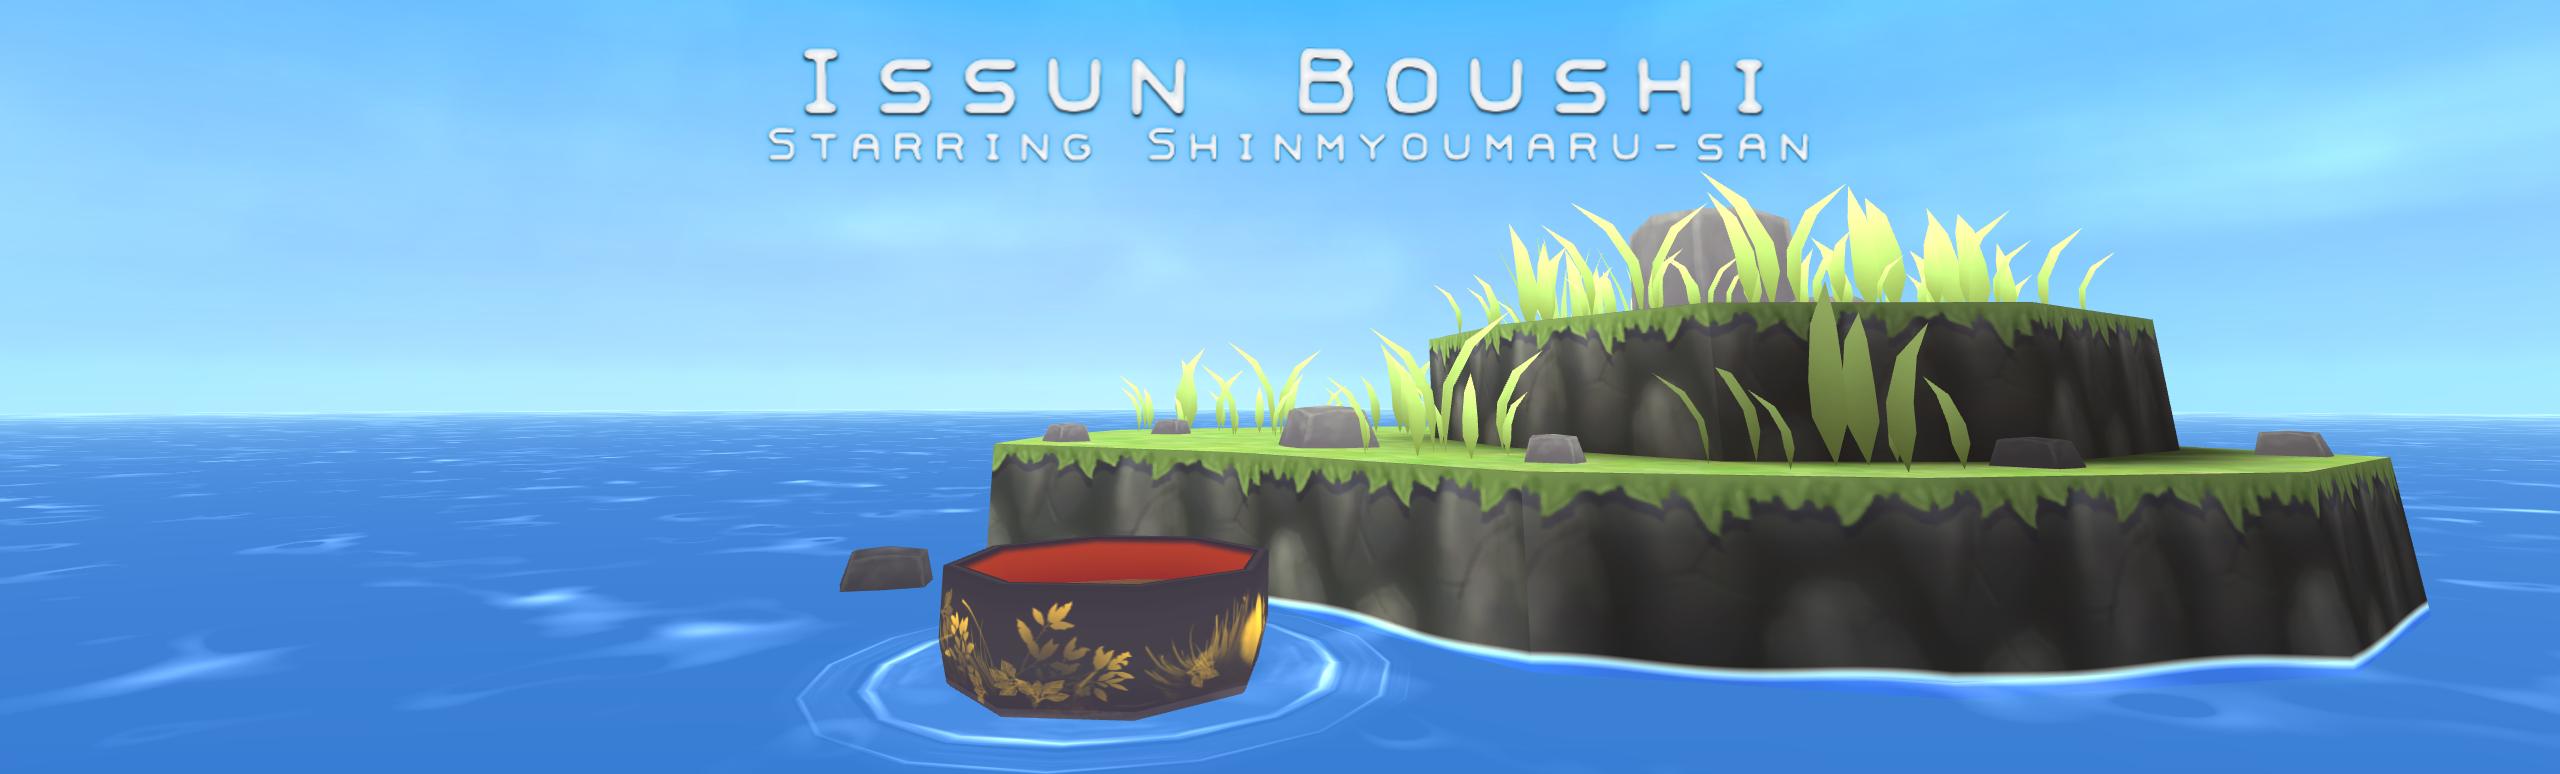 Issun Boushi Starring Shinmyoumaru-san